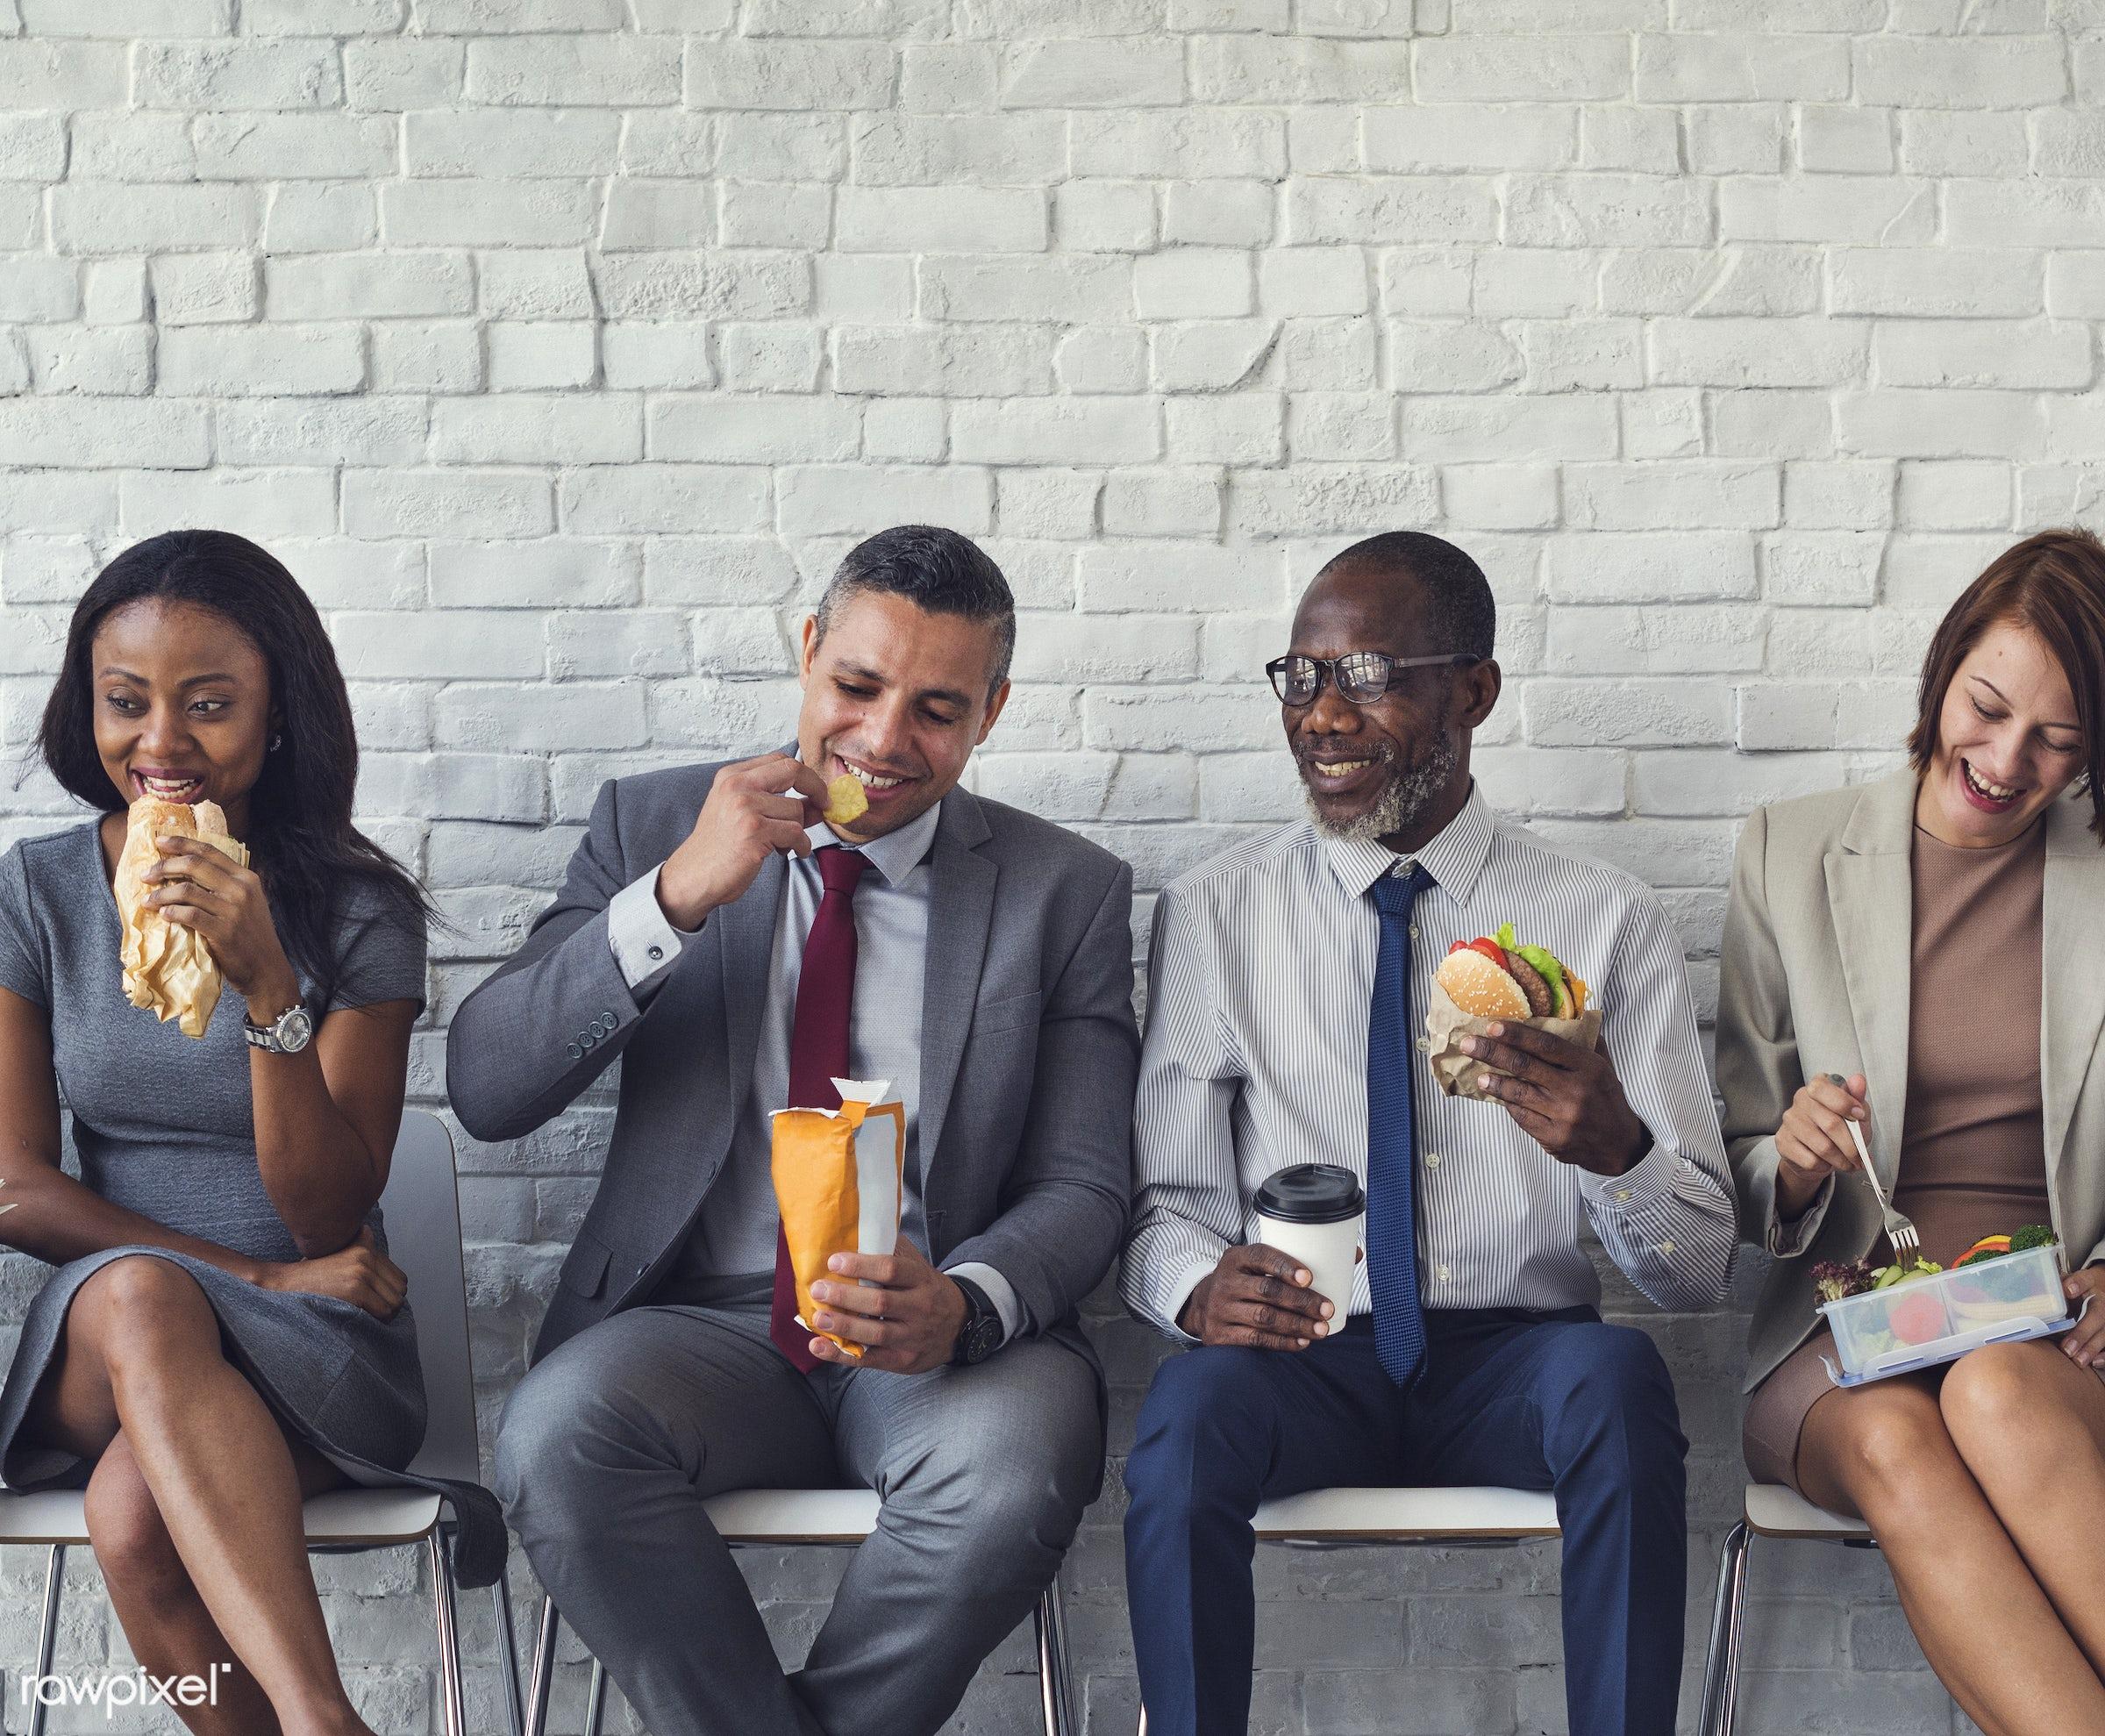 achievement, activity, african descent, assistance, bread, break, breakfast, brunch, burger, business, chip, discussion,...